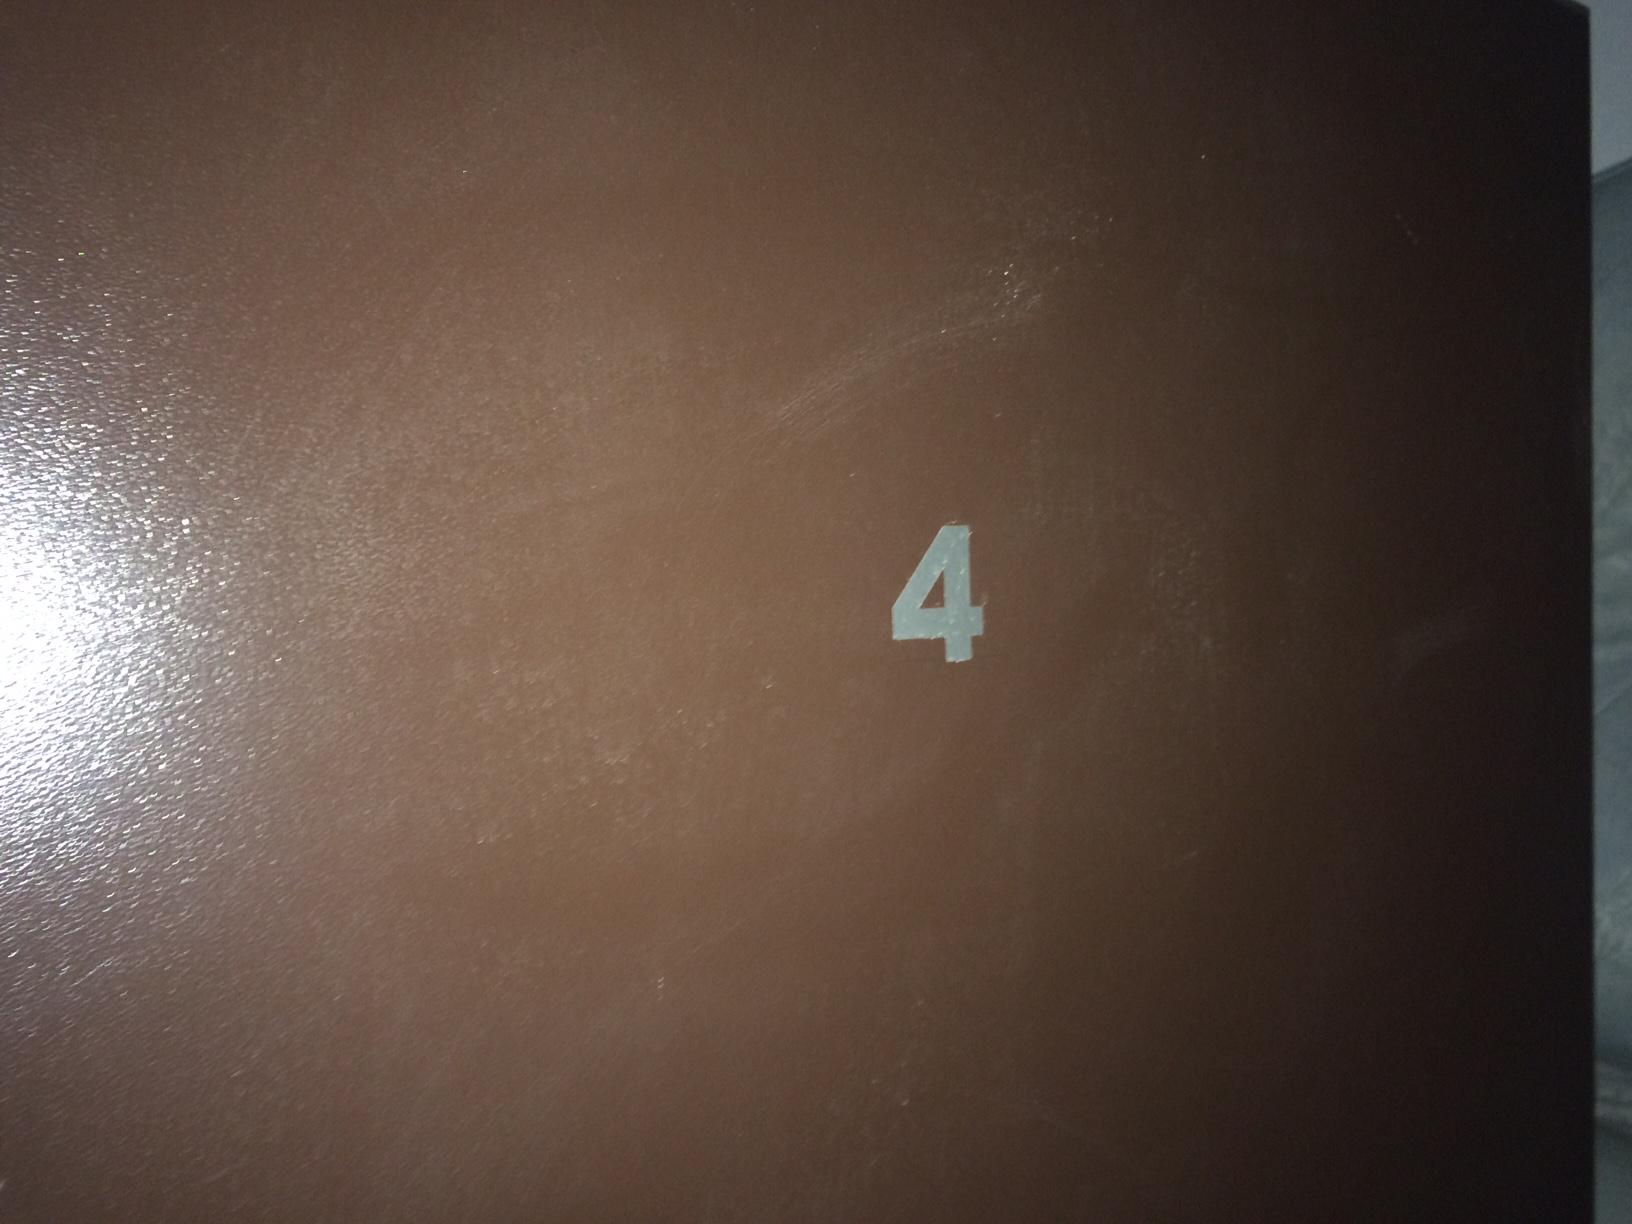 Boxa nr.4, Ansamblu Izvorul Dorului, Sinaia